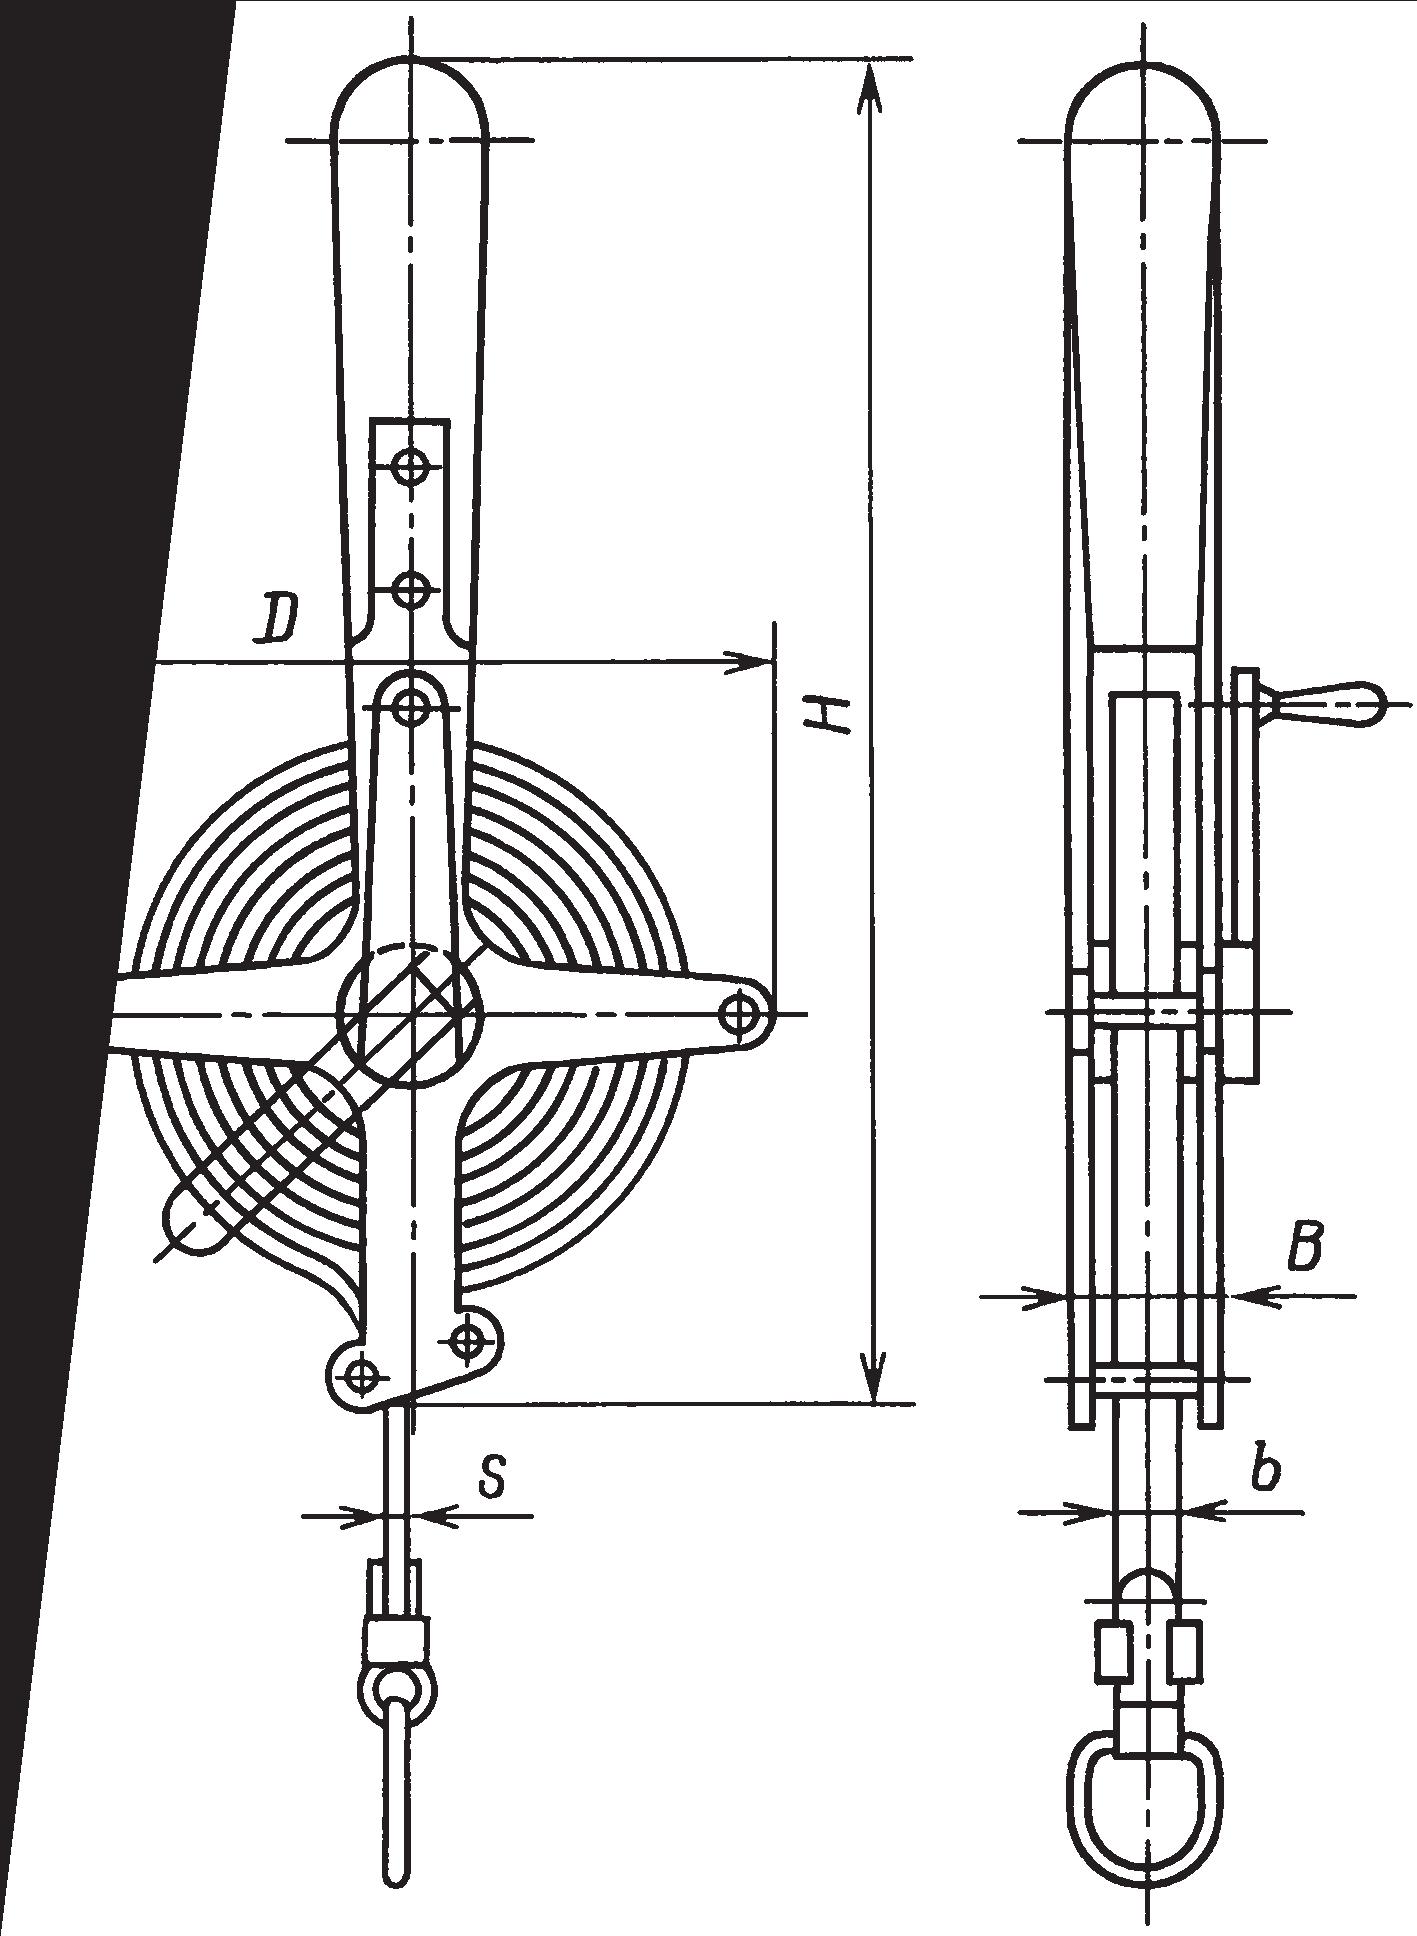 Рулетка в открытом корпусе на крестовине